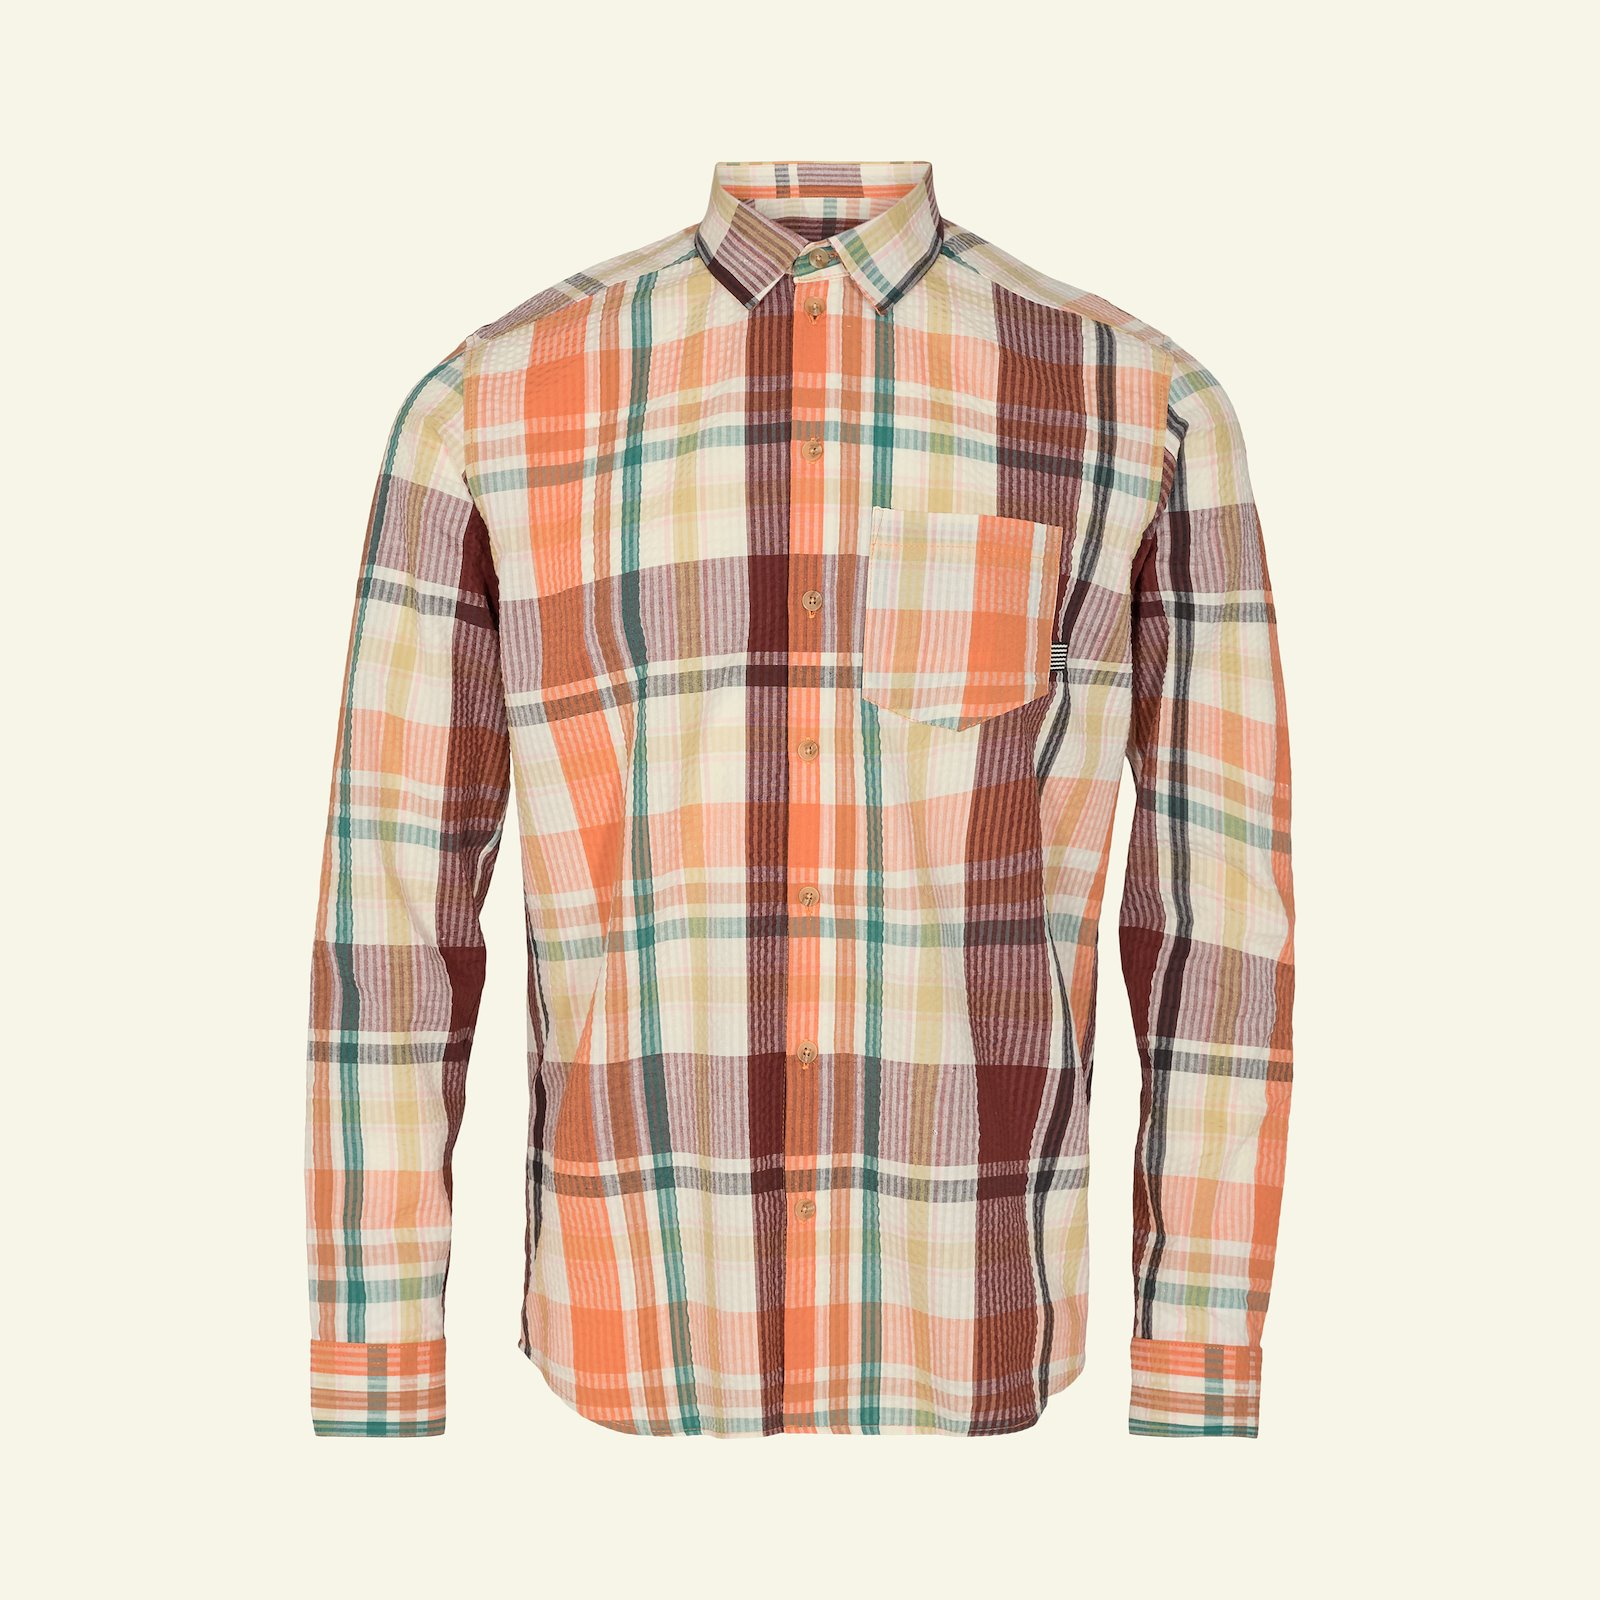 Shirt, M p87001_580049_33044_sskit